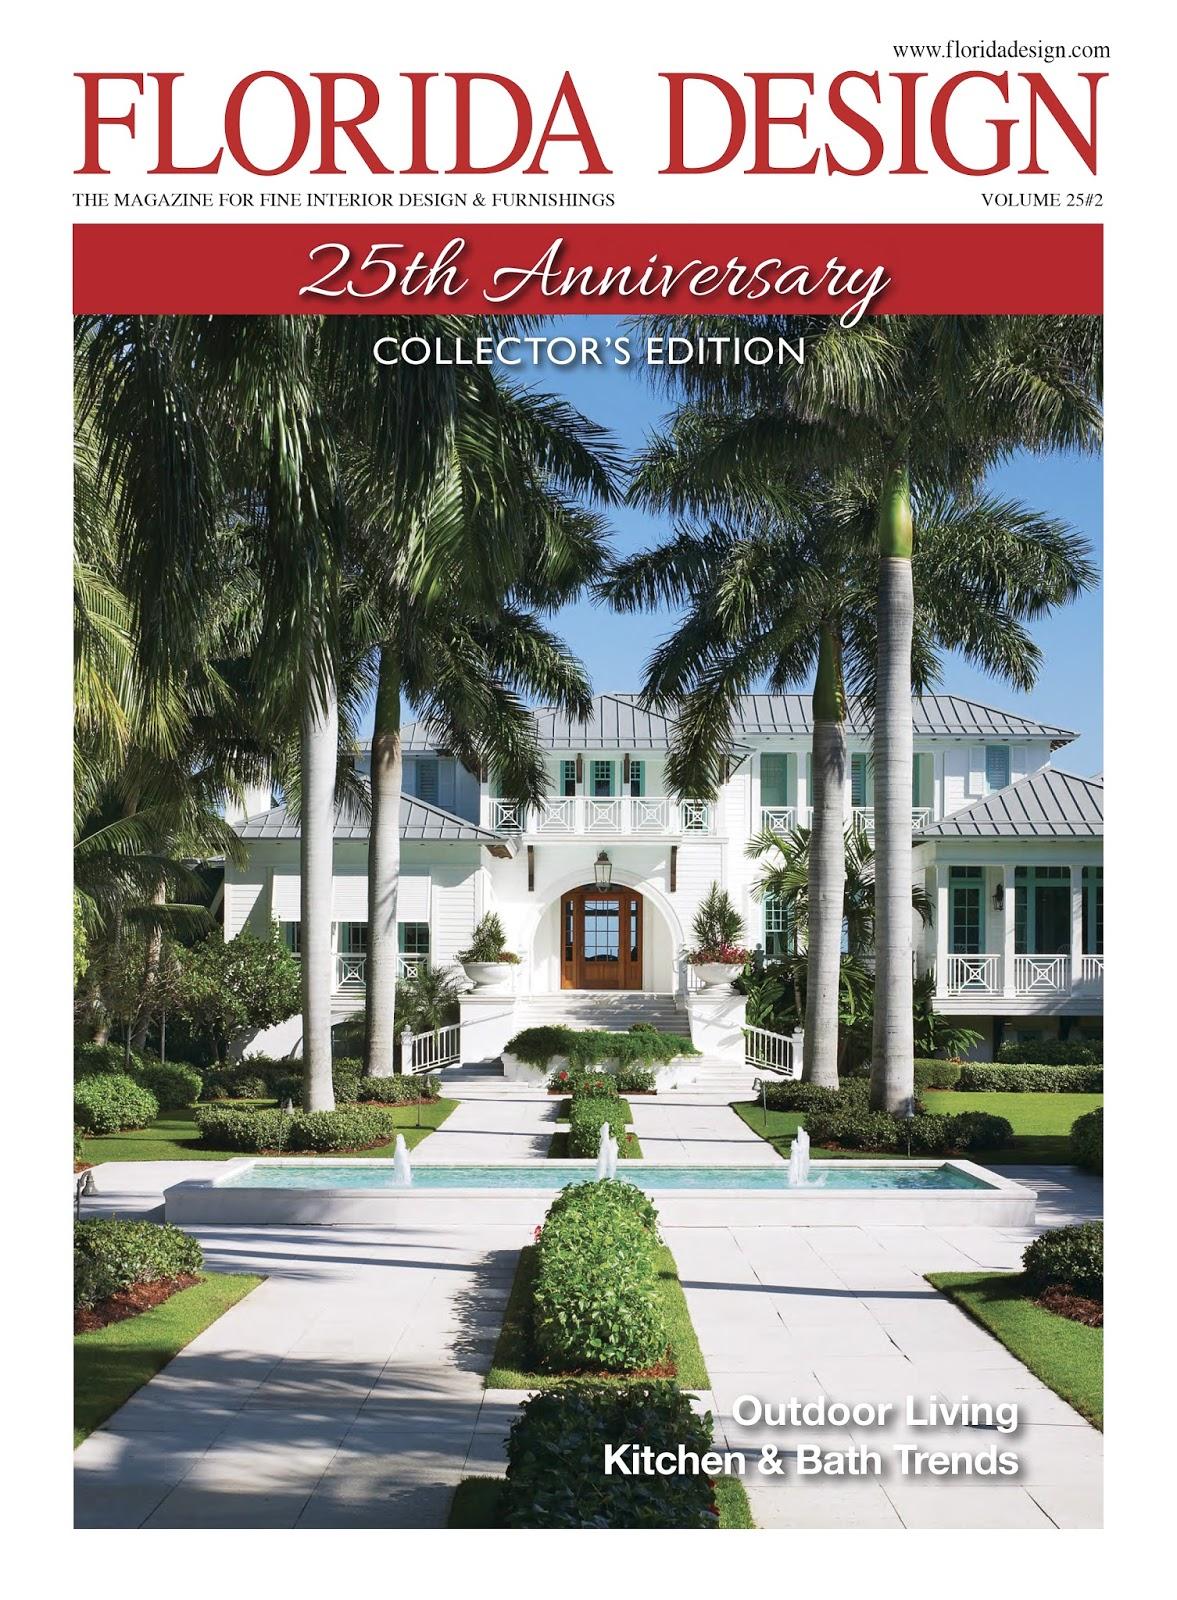 Jessica glynn florida design architect clemens bruns for Florida design